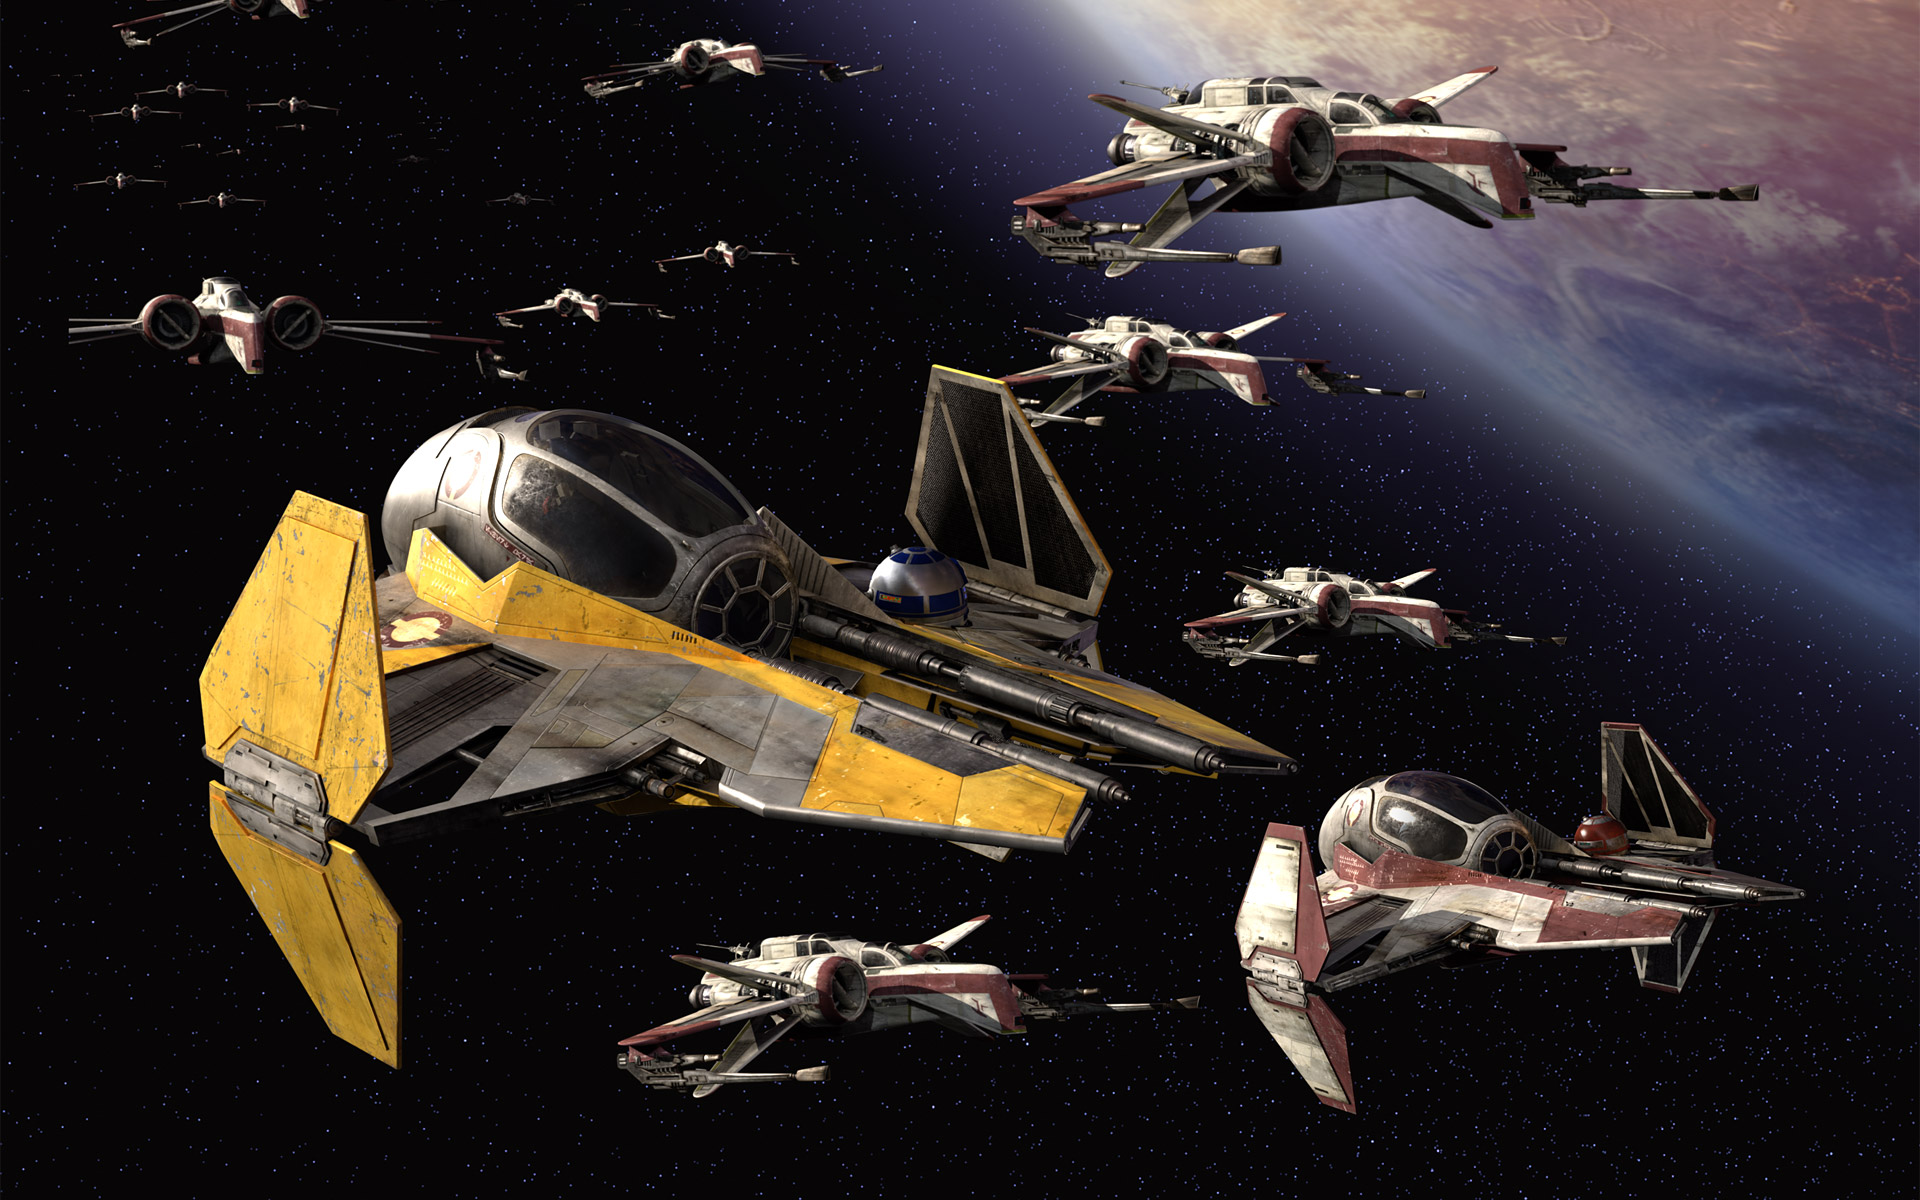 Wars Fantasy Spaceship Wallpaper Desktop Background Hd Screensaver 1920x1200